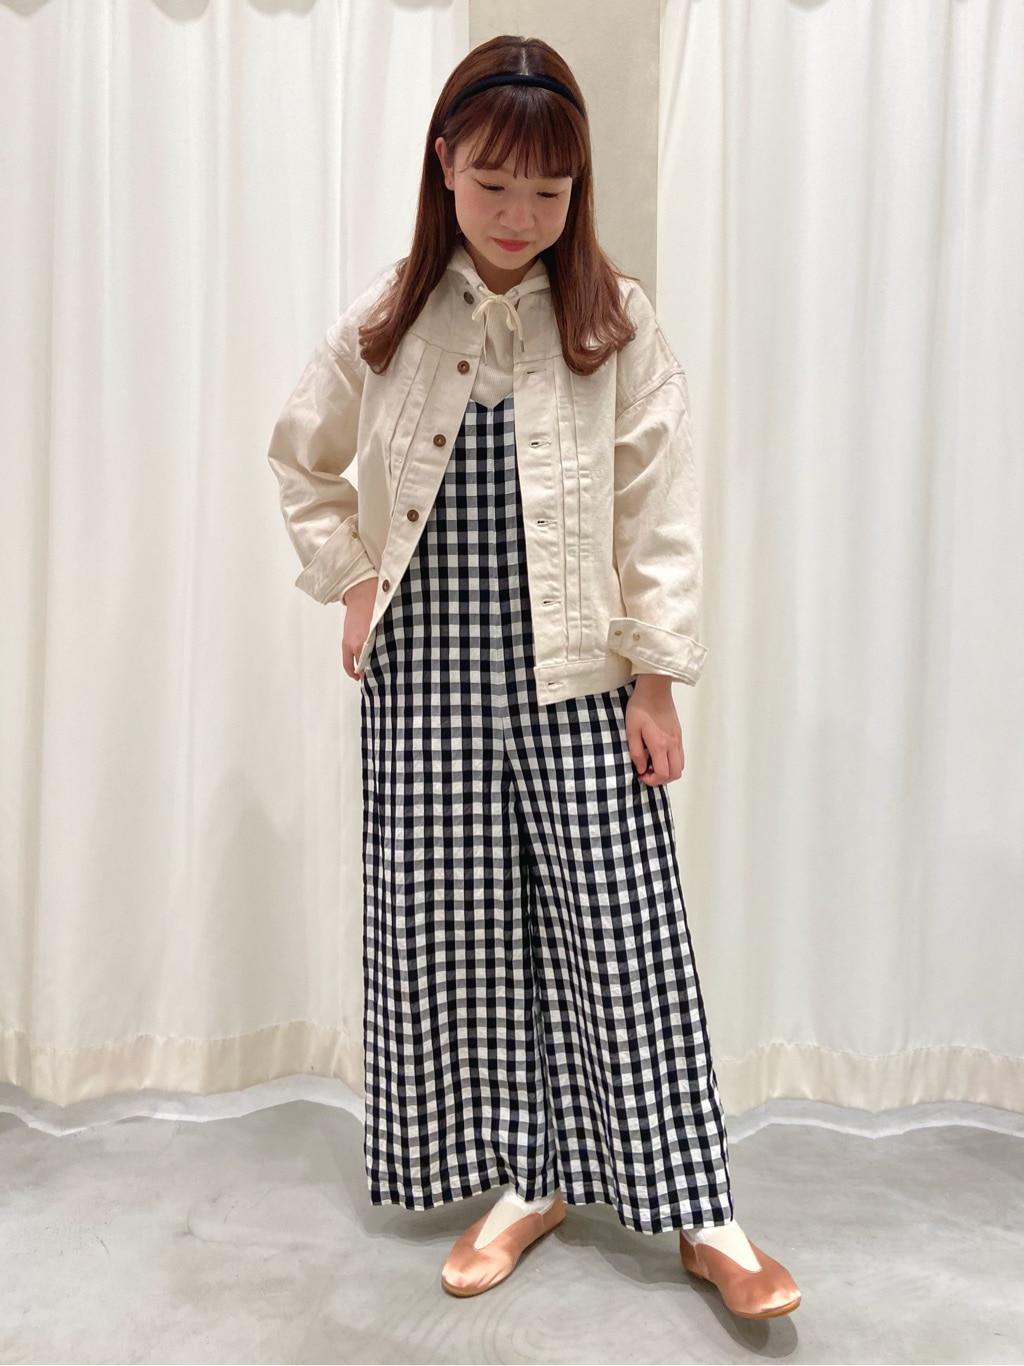 CHILD WOMAN , PAR ICI 東京スカイツリータウン・ソラマチ 2021.02.09